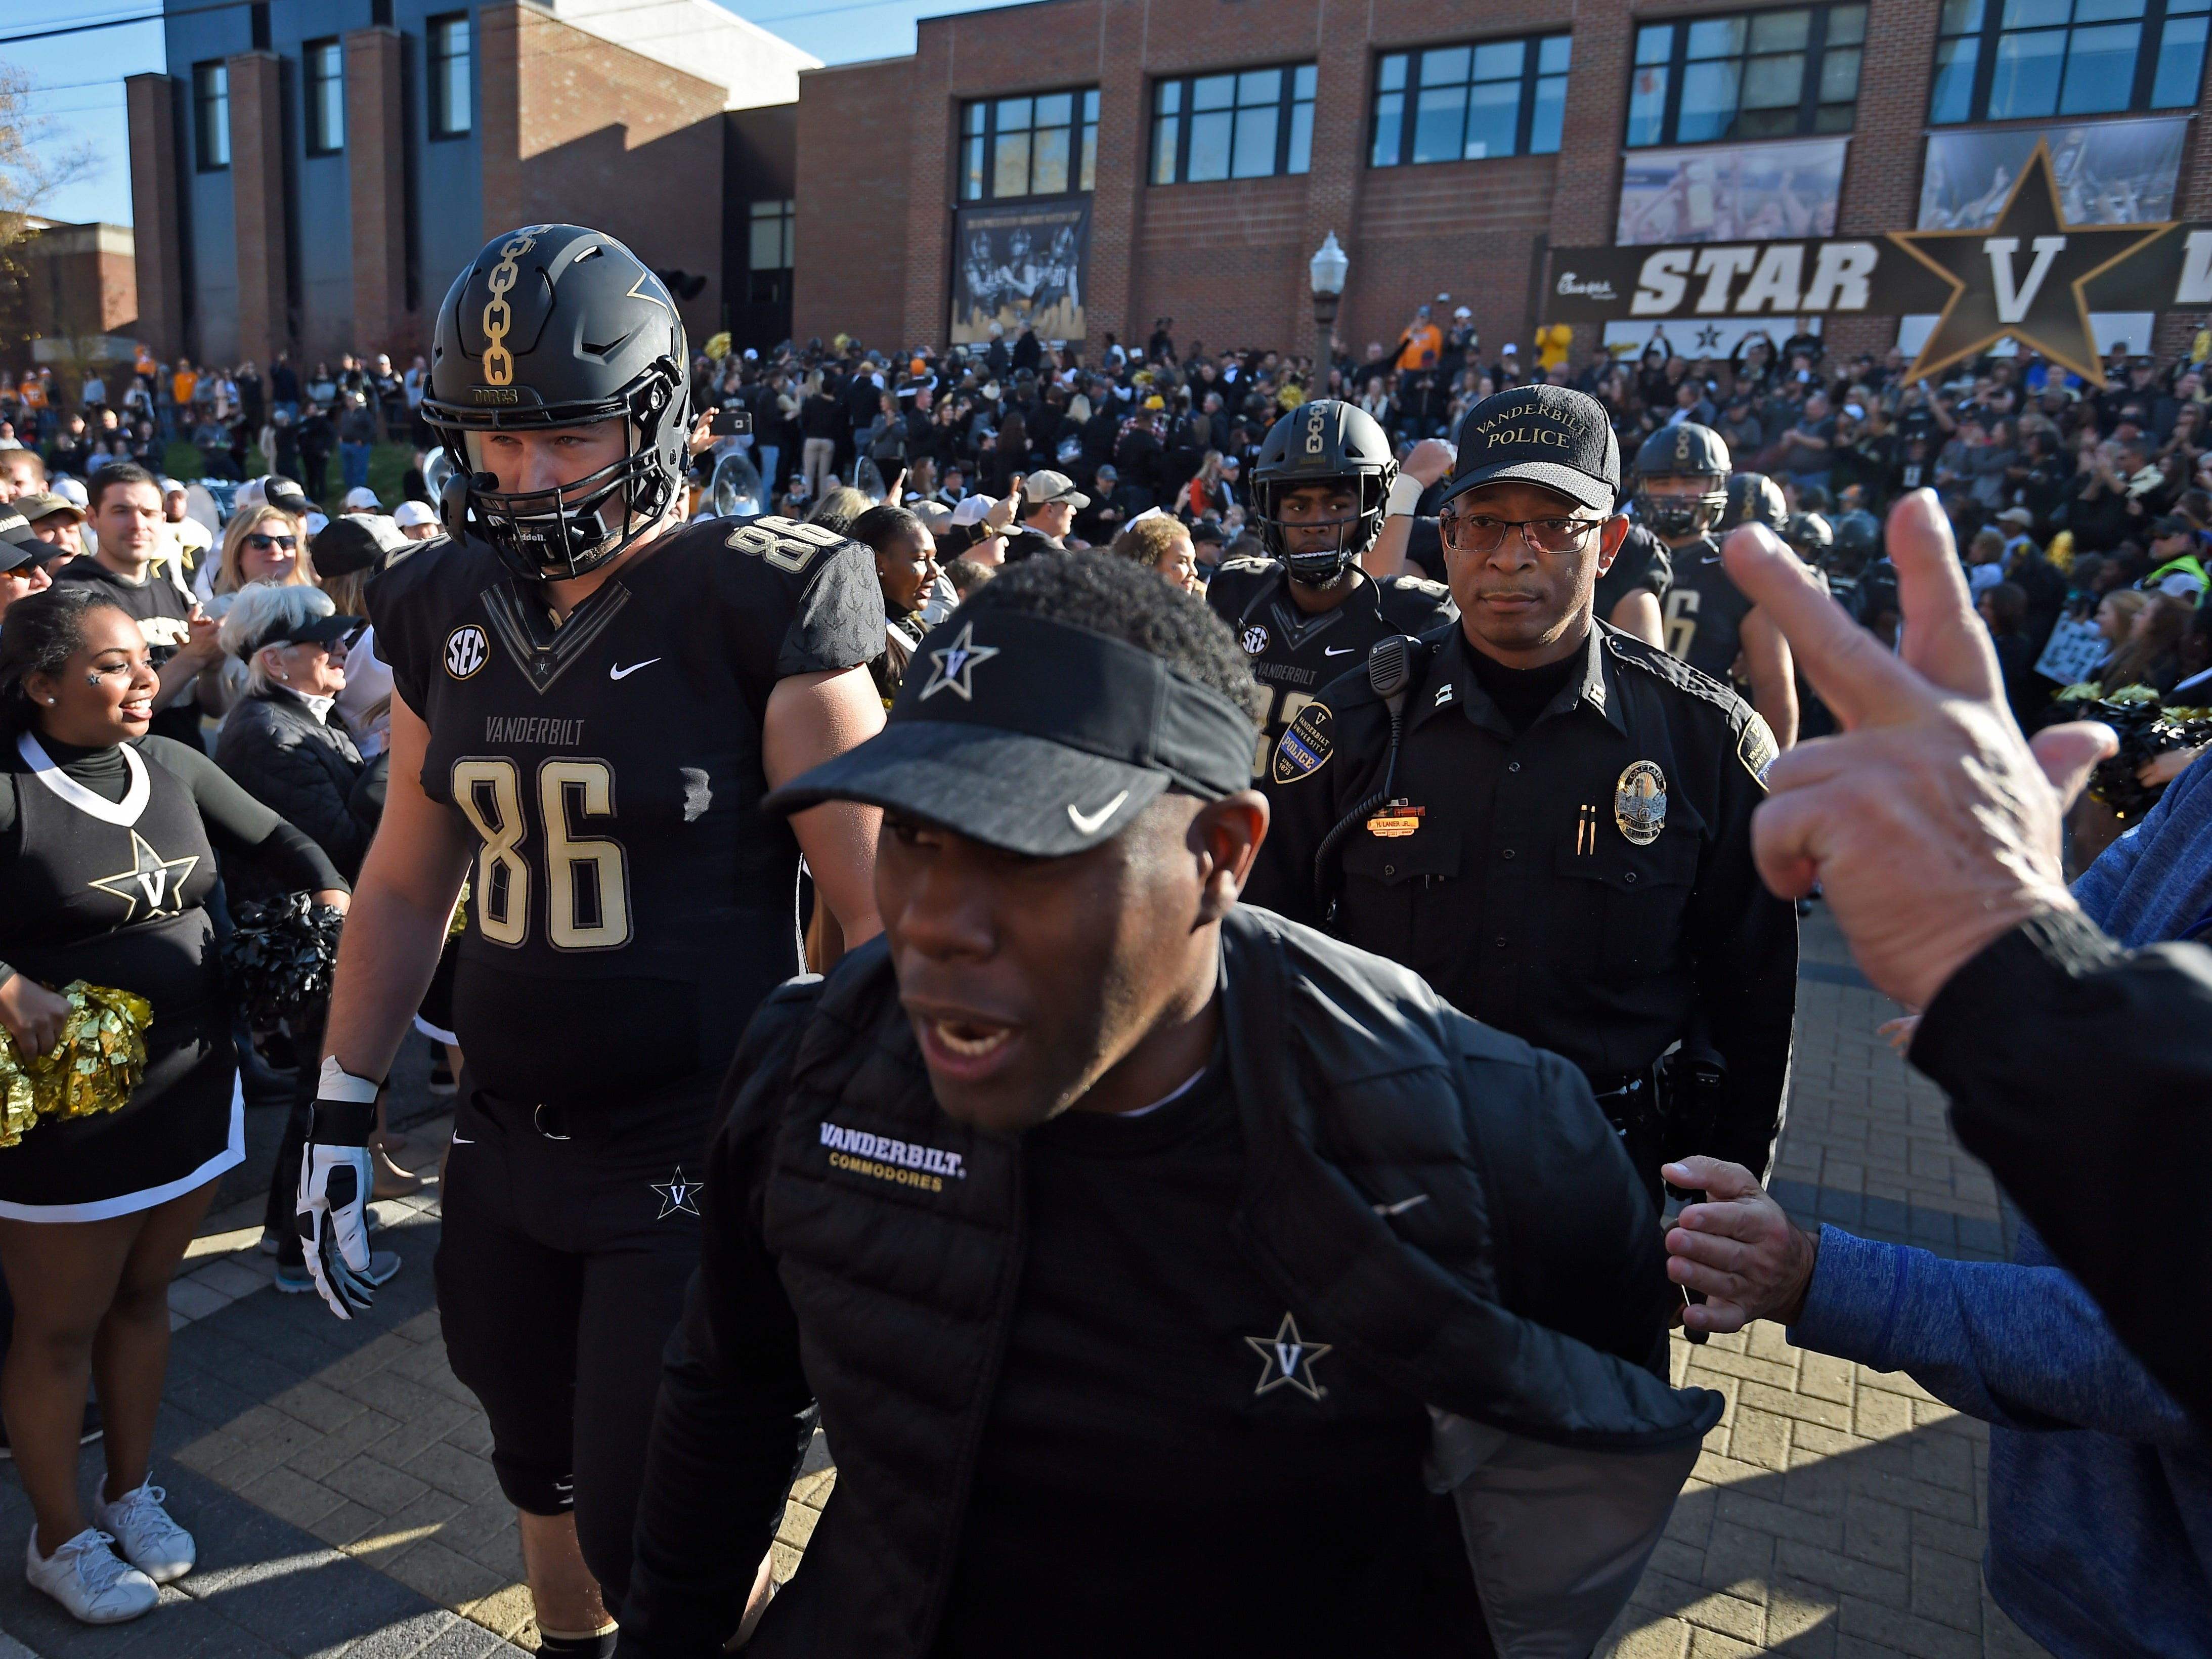 Vanderbilt head coach Derek Mason leads the team during Star Walk at Vanderbilt Stadium Saturday, Nov. 24, 2018, in Nashville, Tenn.